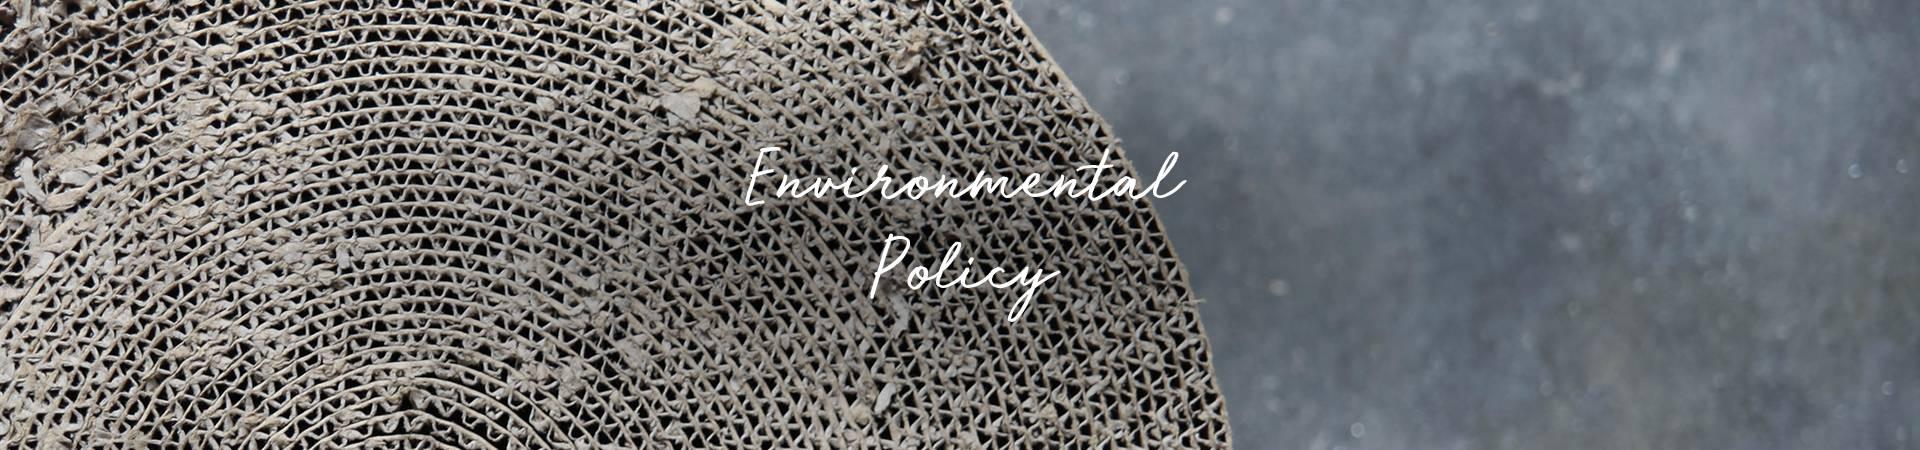 Environmental Policy_desktop_1.jpg